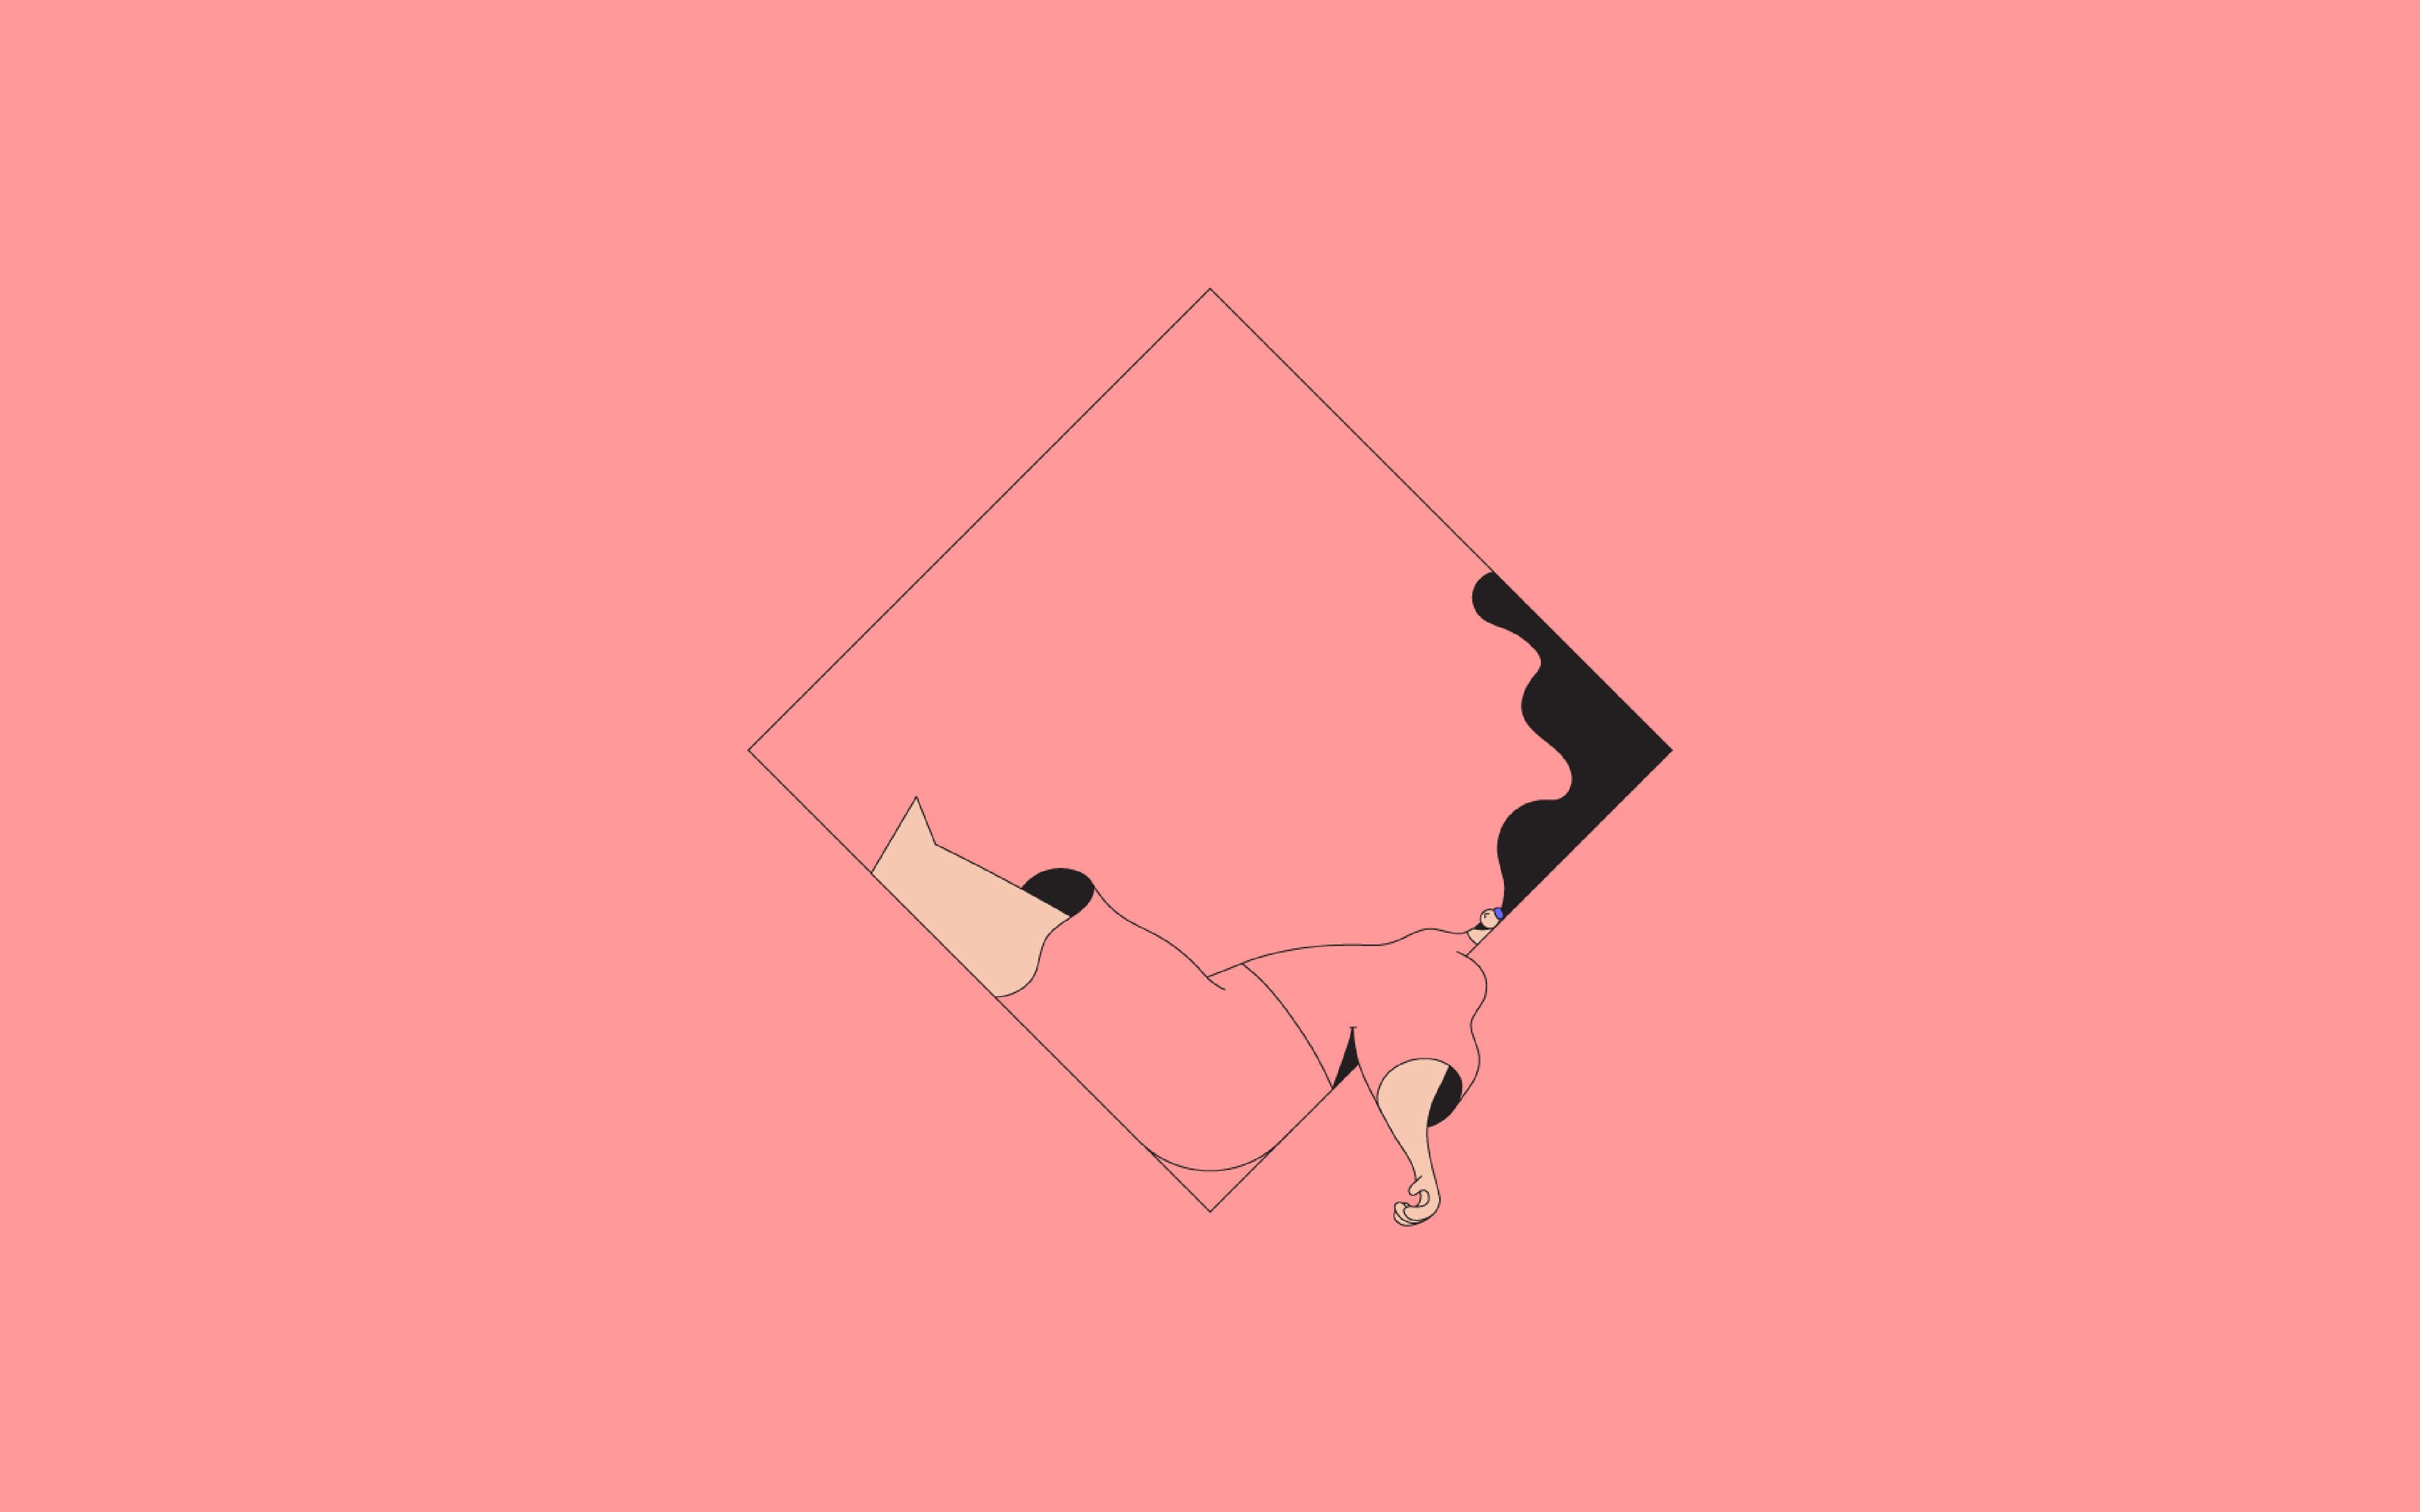 papers.co bb08 minimal drawing pink illustration art 36 3840x2400 4k wallpaper